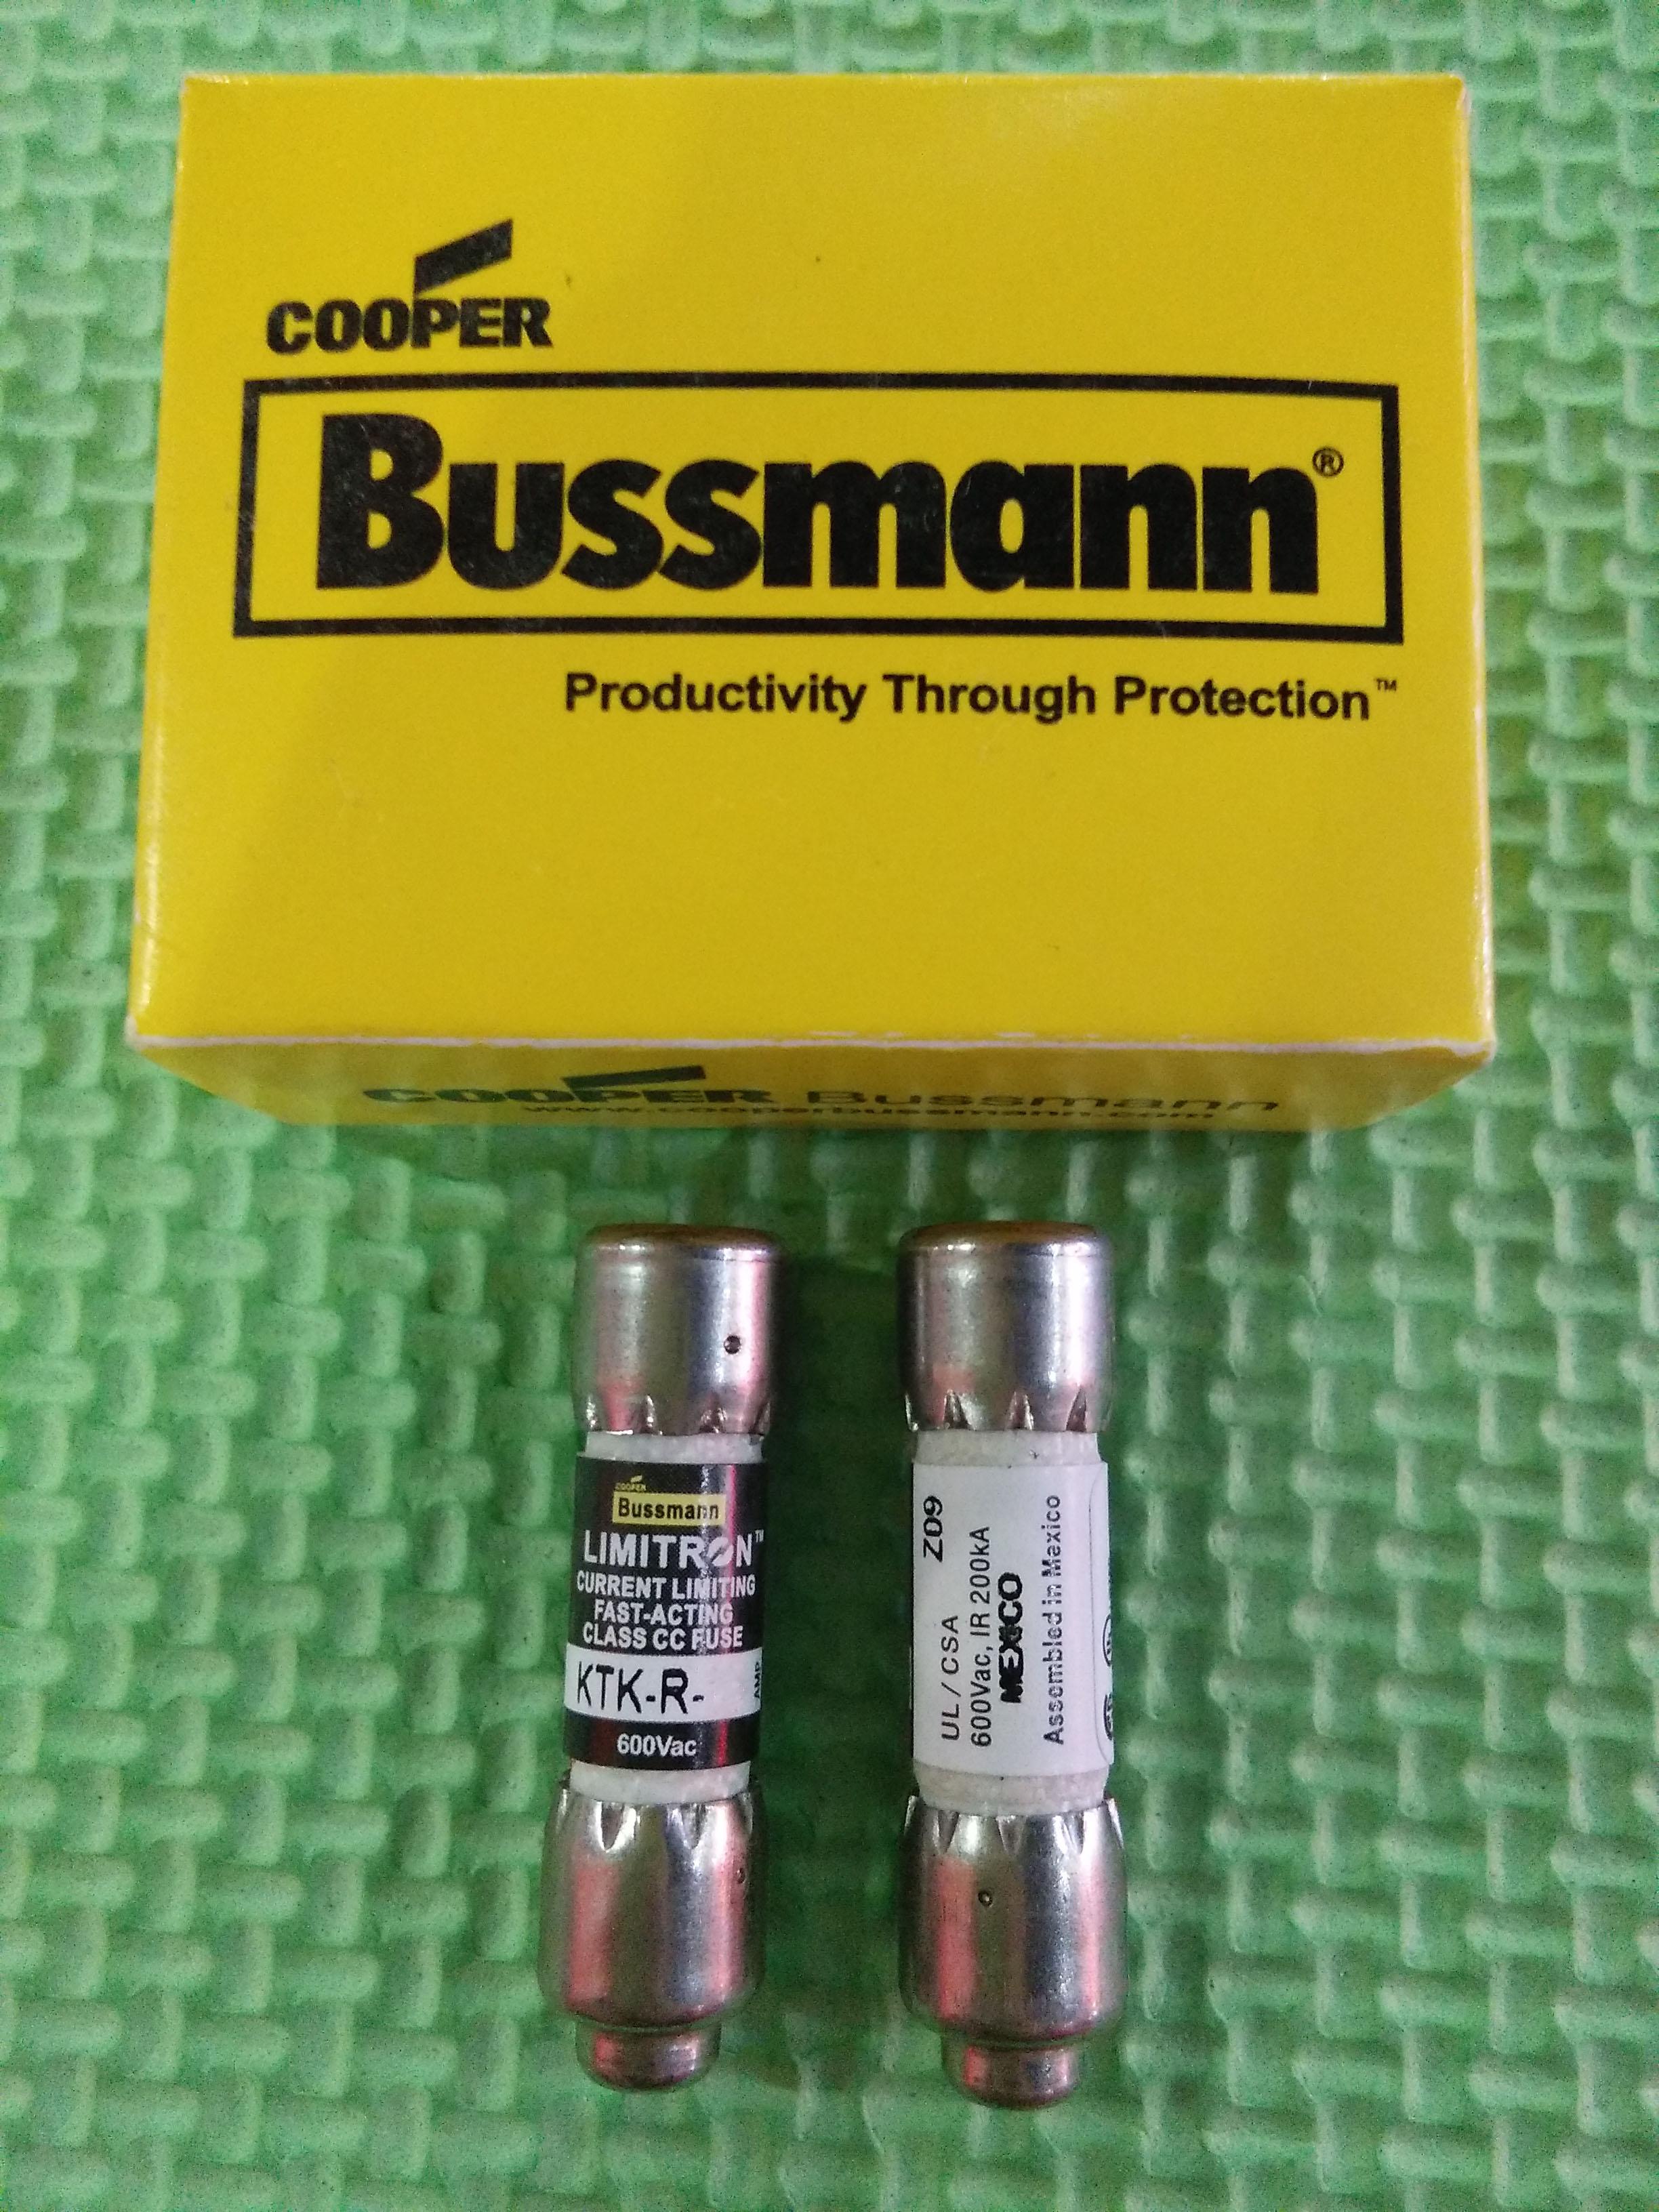 10pcs Bussmann KTK-R-30 30 Amp 600V Fast-Acting Fuses KTK-R-30